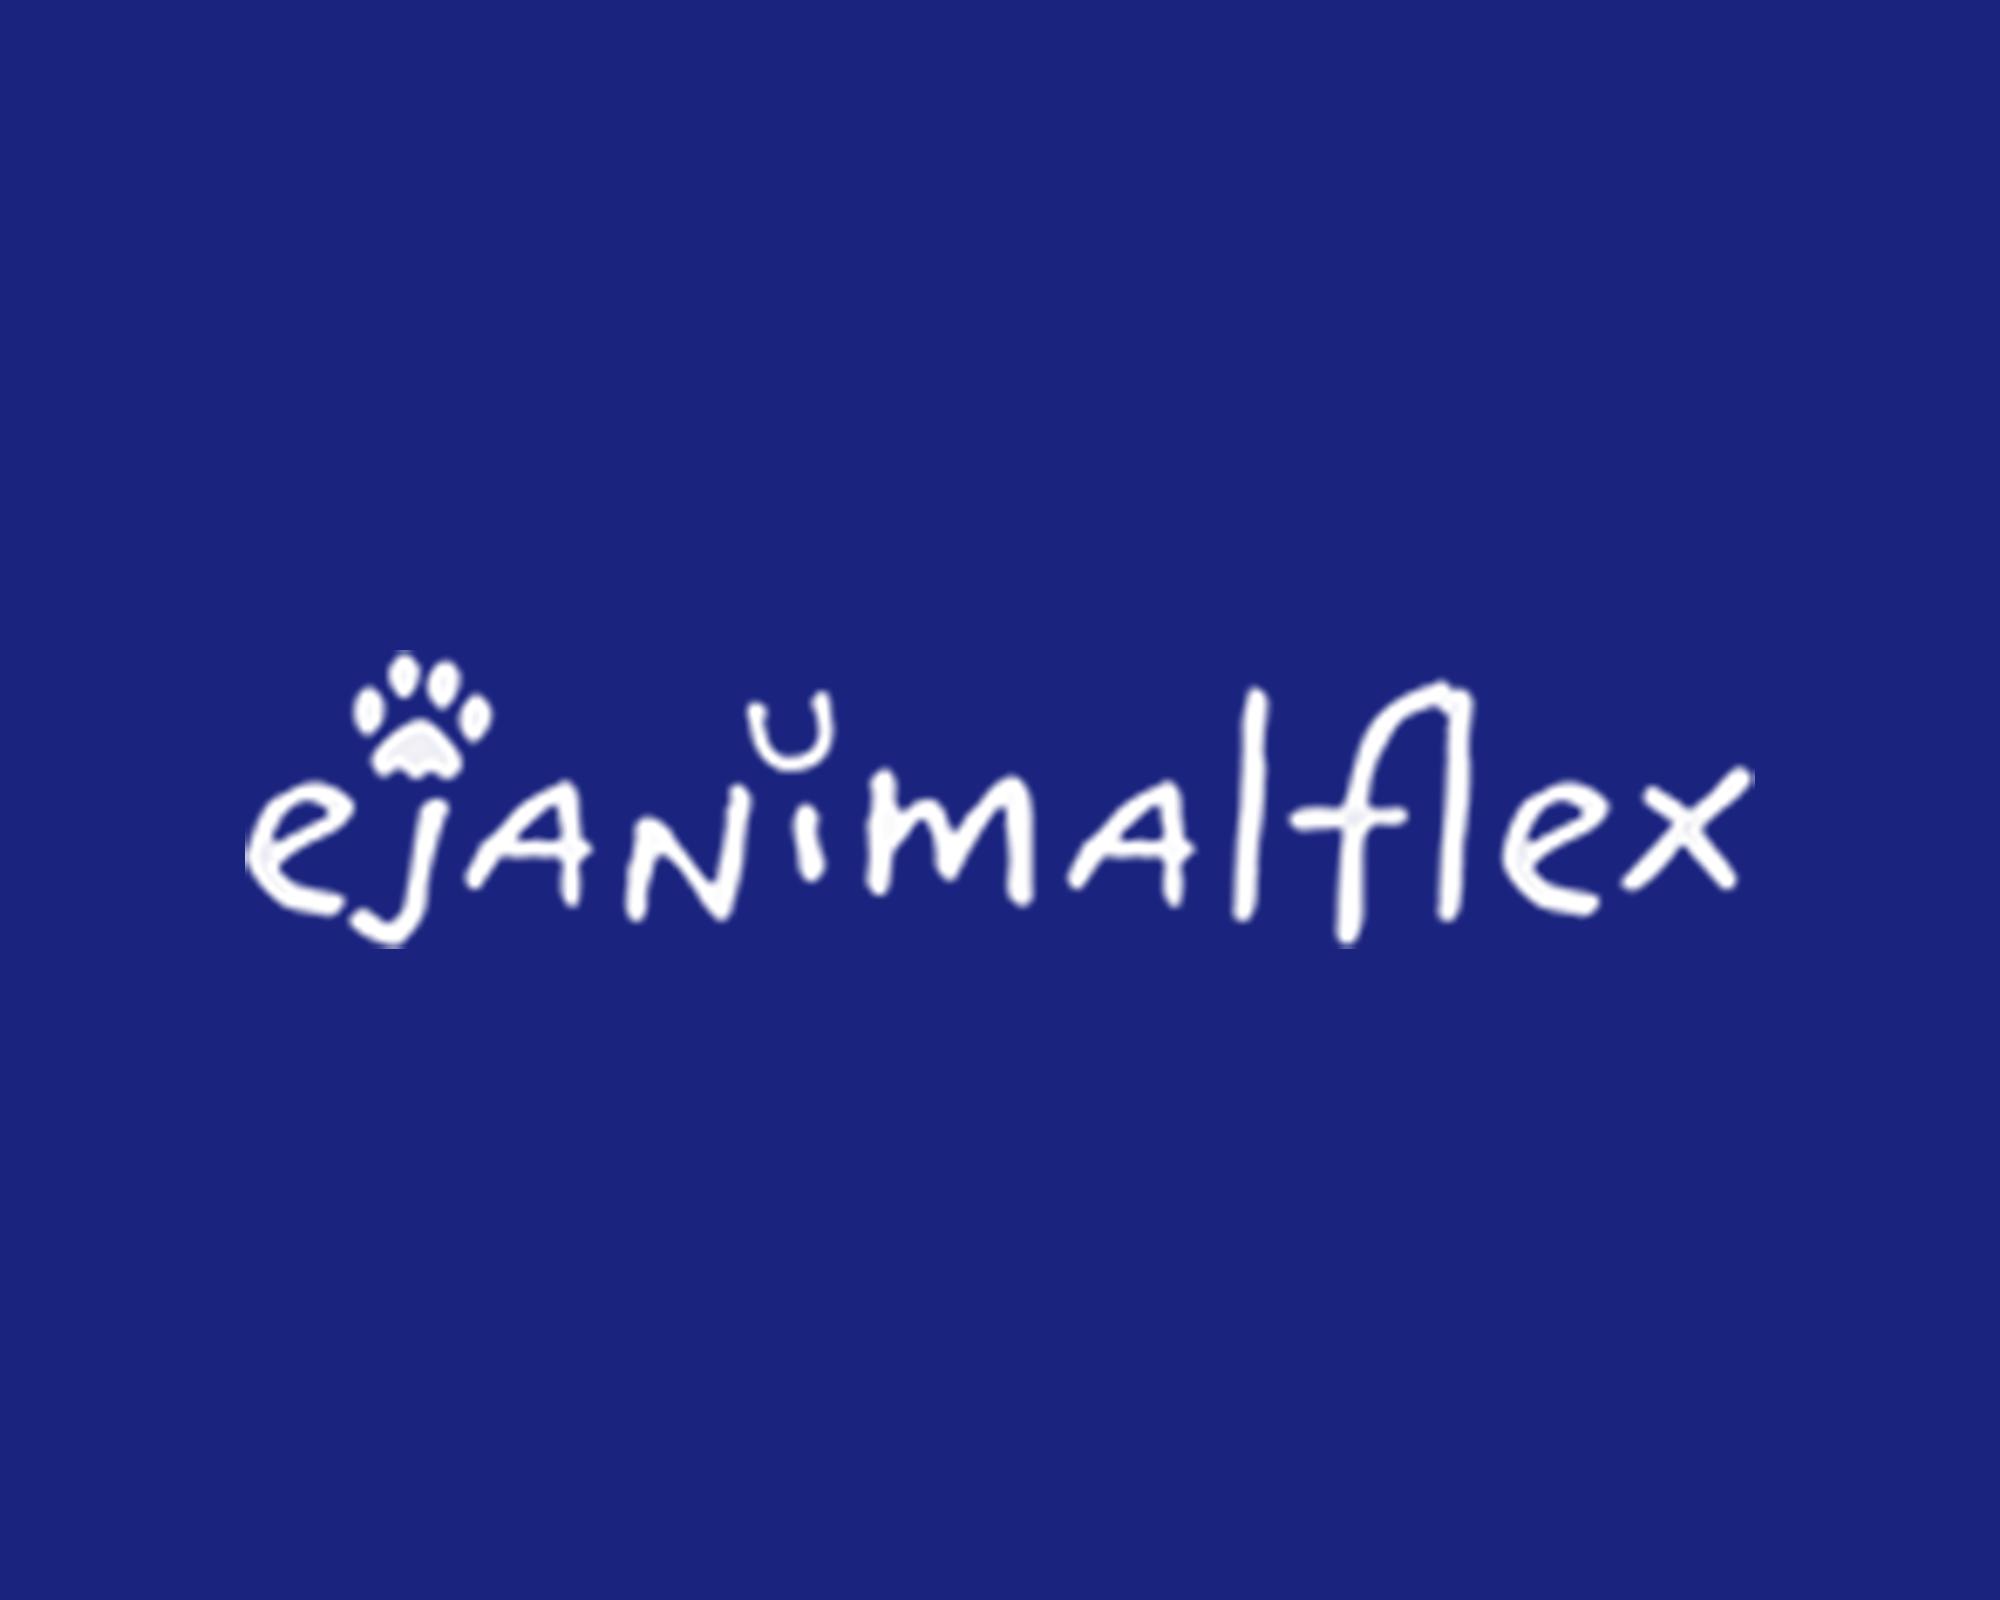 ejanimalflex Logo